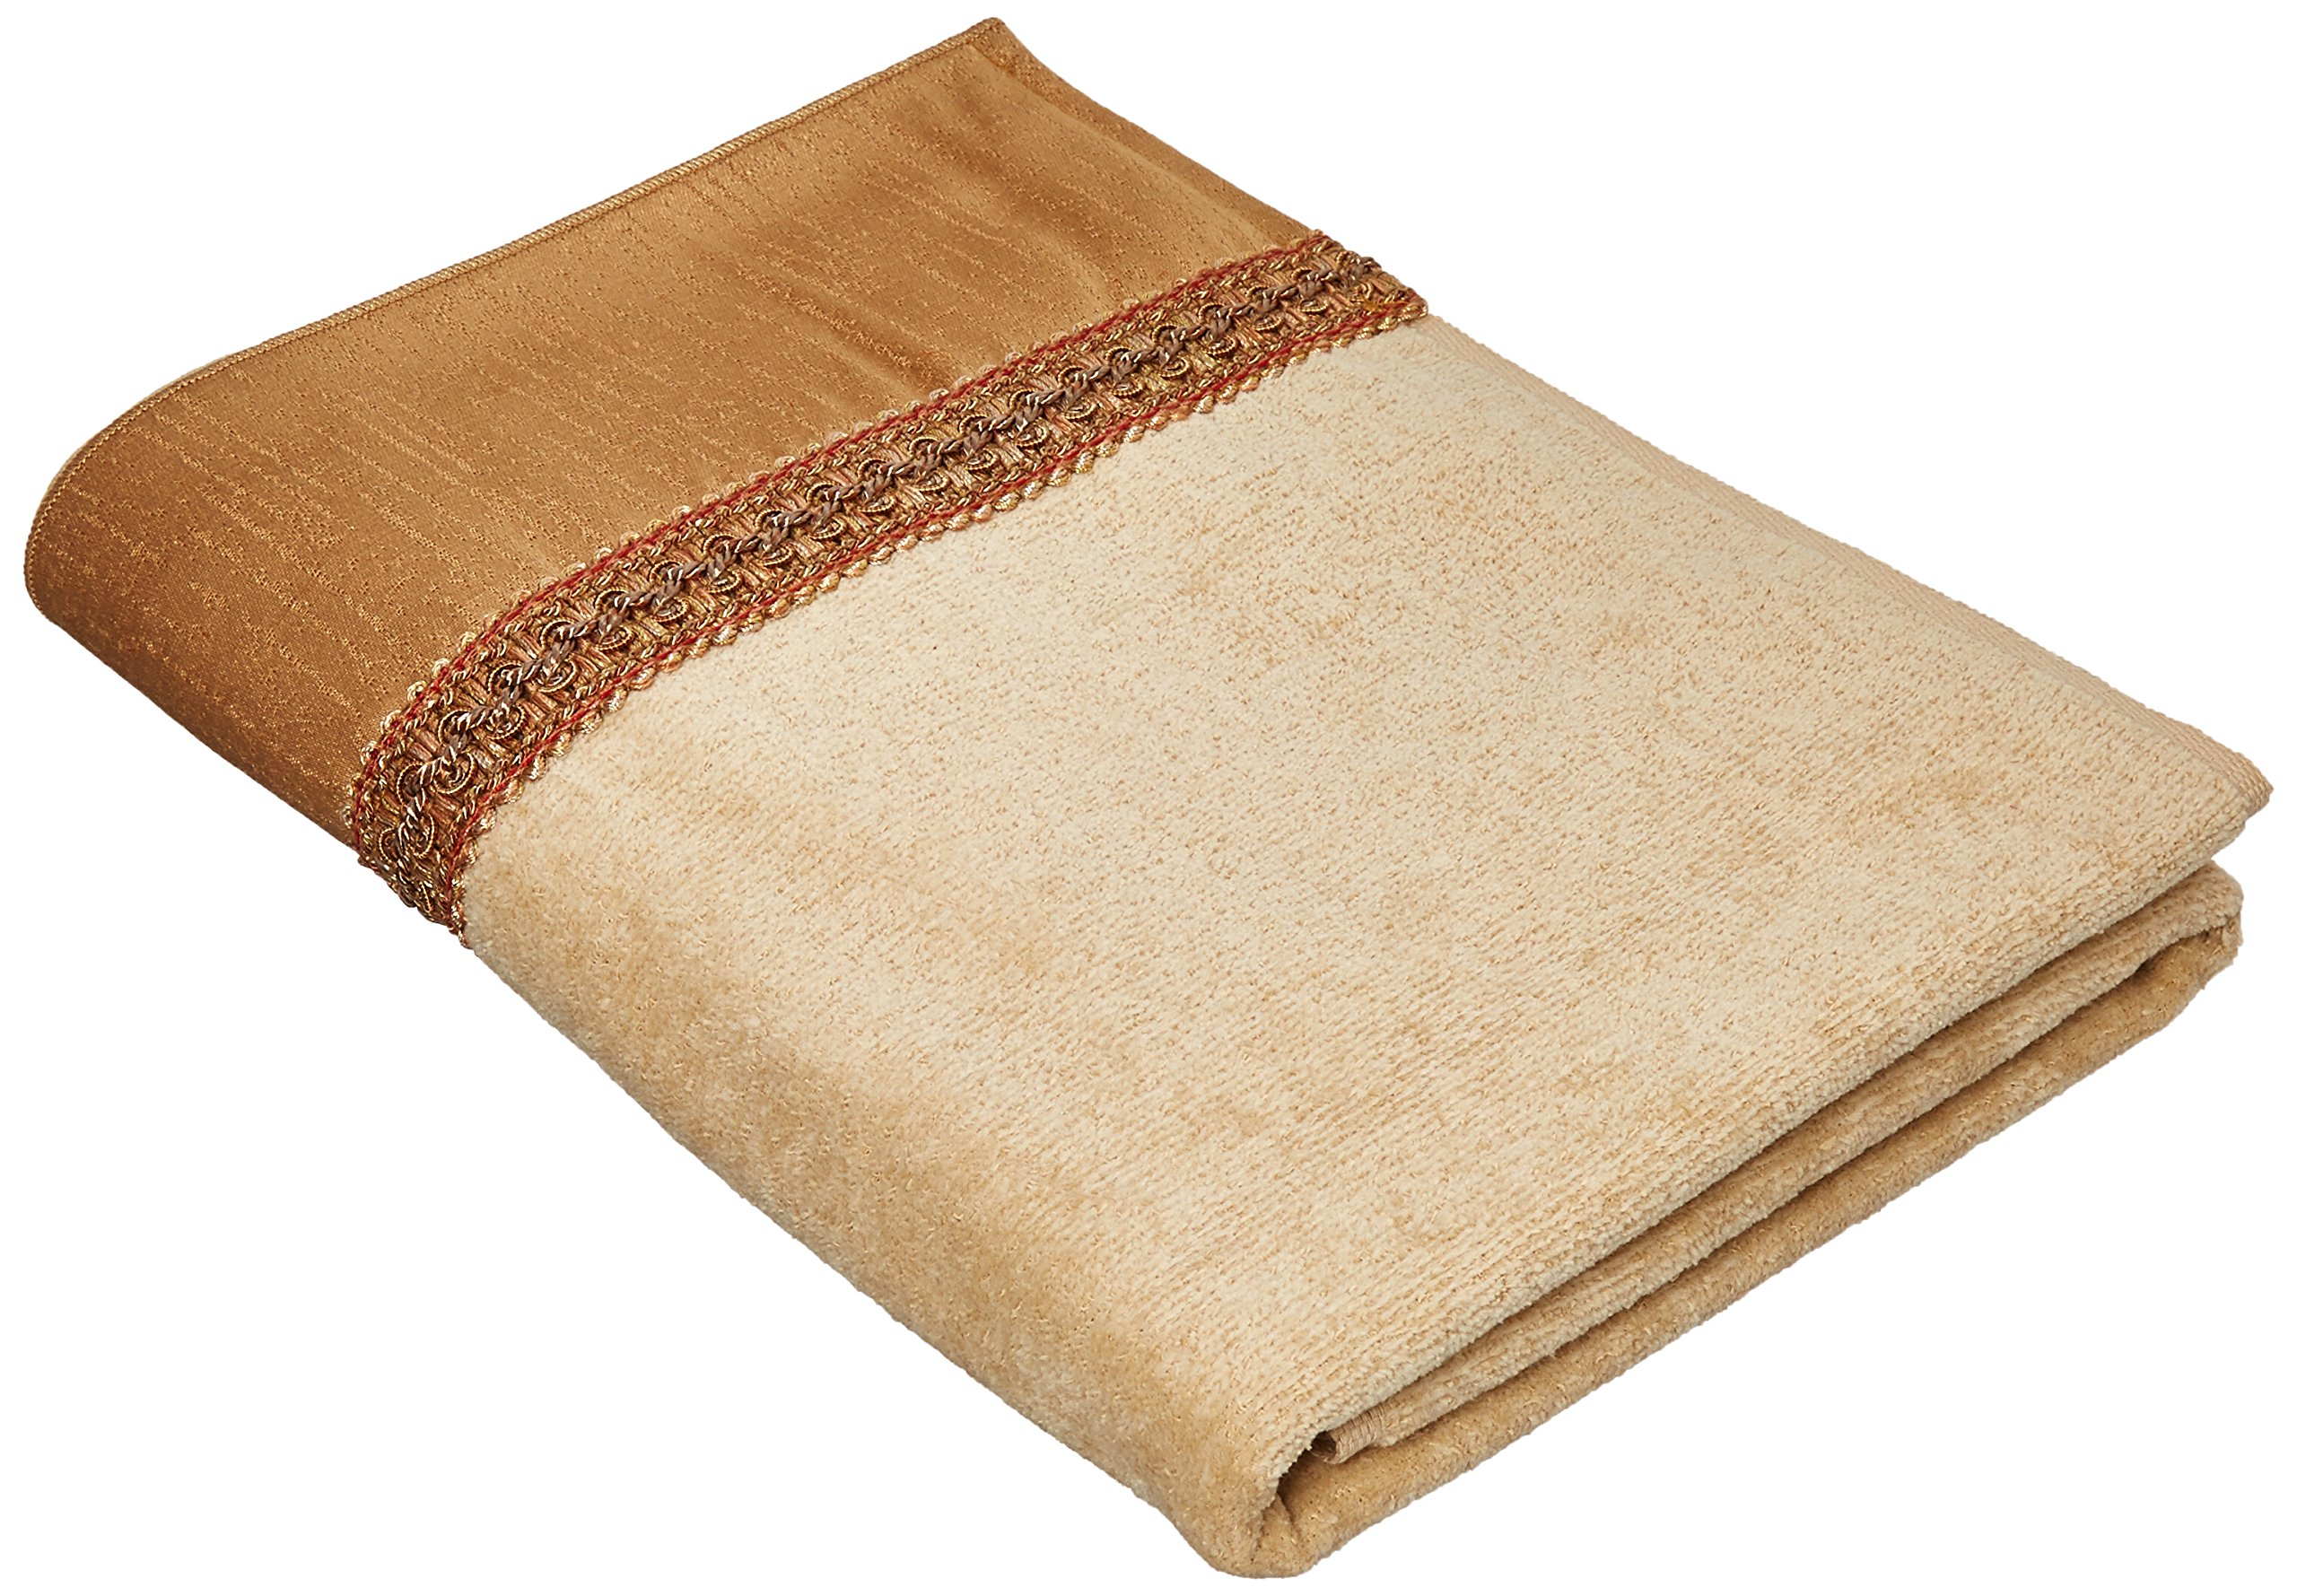 Avanti Braided Cuff Bath Towel - The towels are 100% cotton Fashionable decorative towel Top quality - bathroom-linens, bathroom, bath-towels - 91fLusjzRiL -